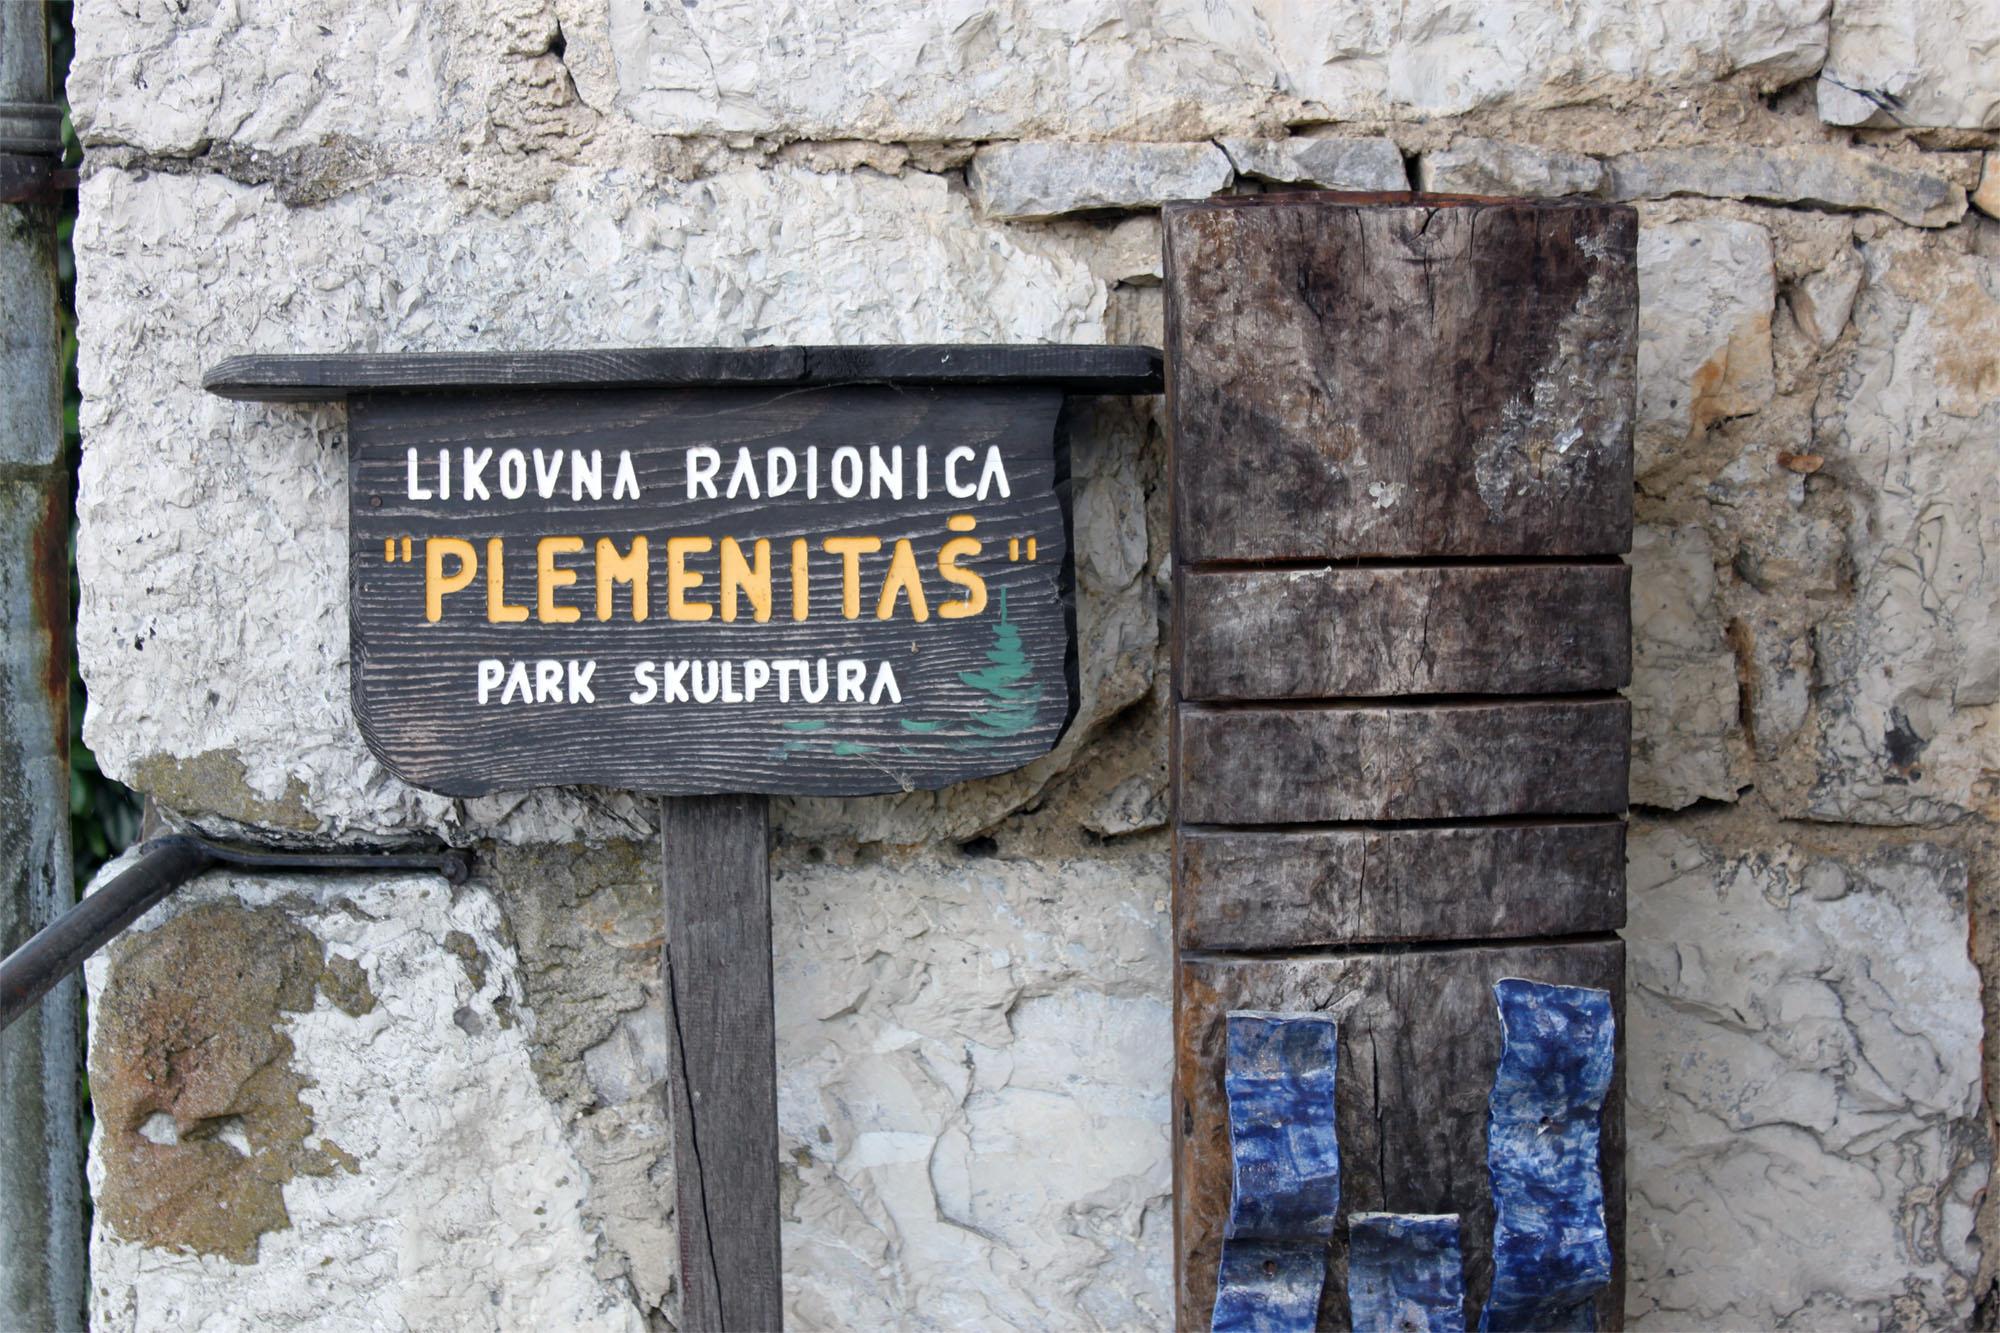 PLEMENITAS_sm_0027_arriving_in_plemenitas